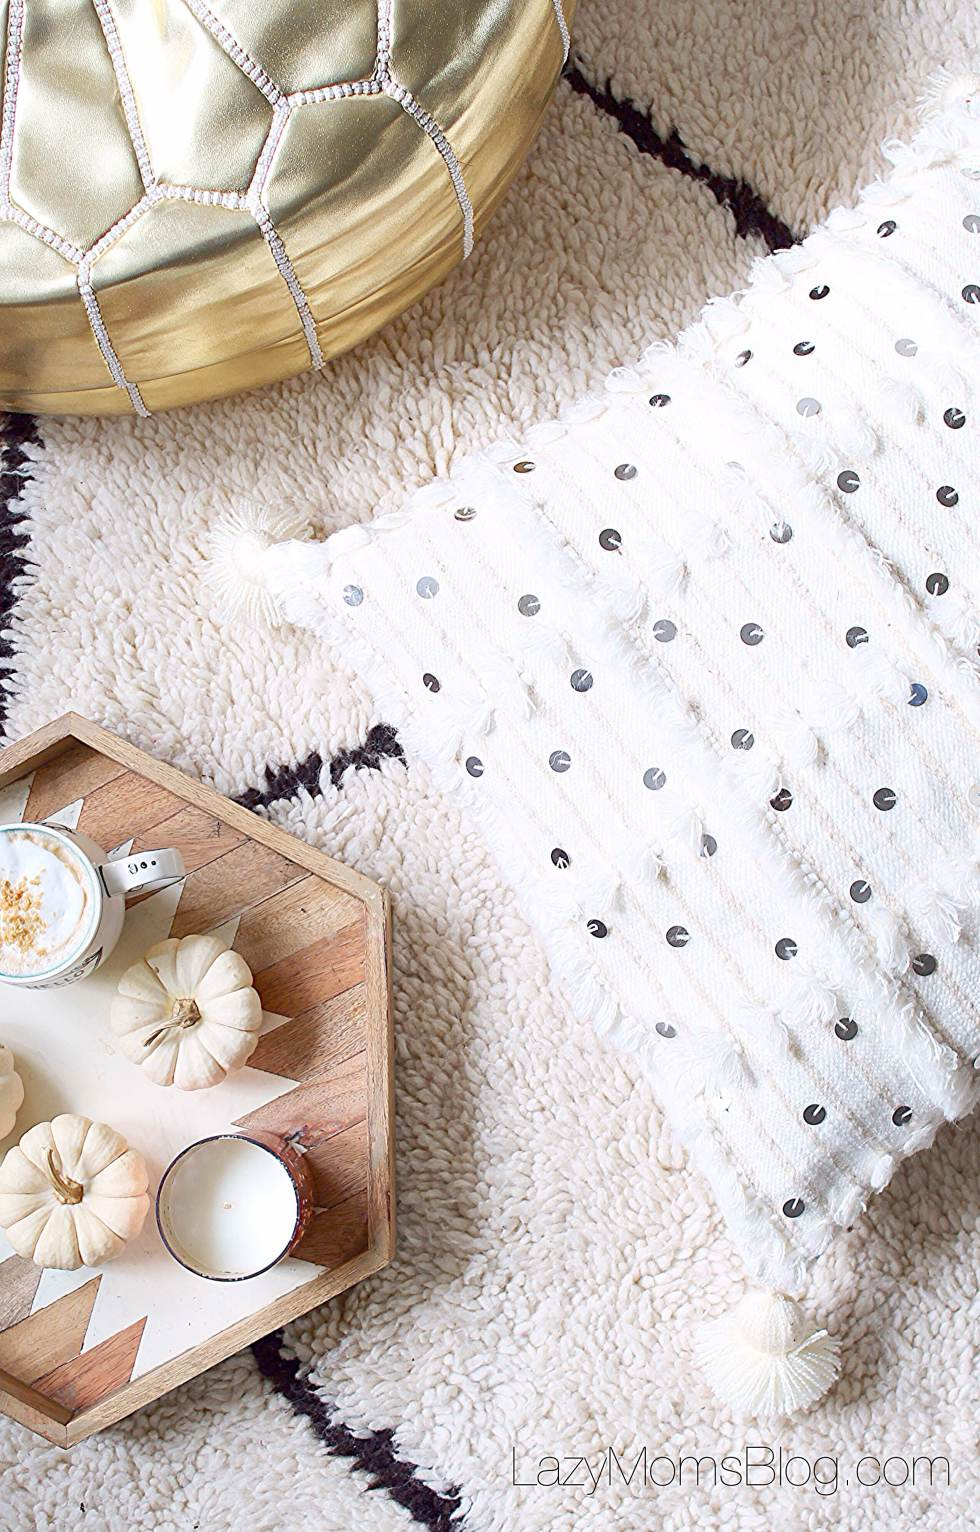 cozy room decor ideas